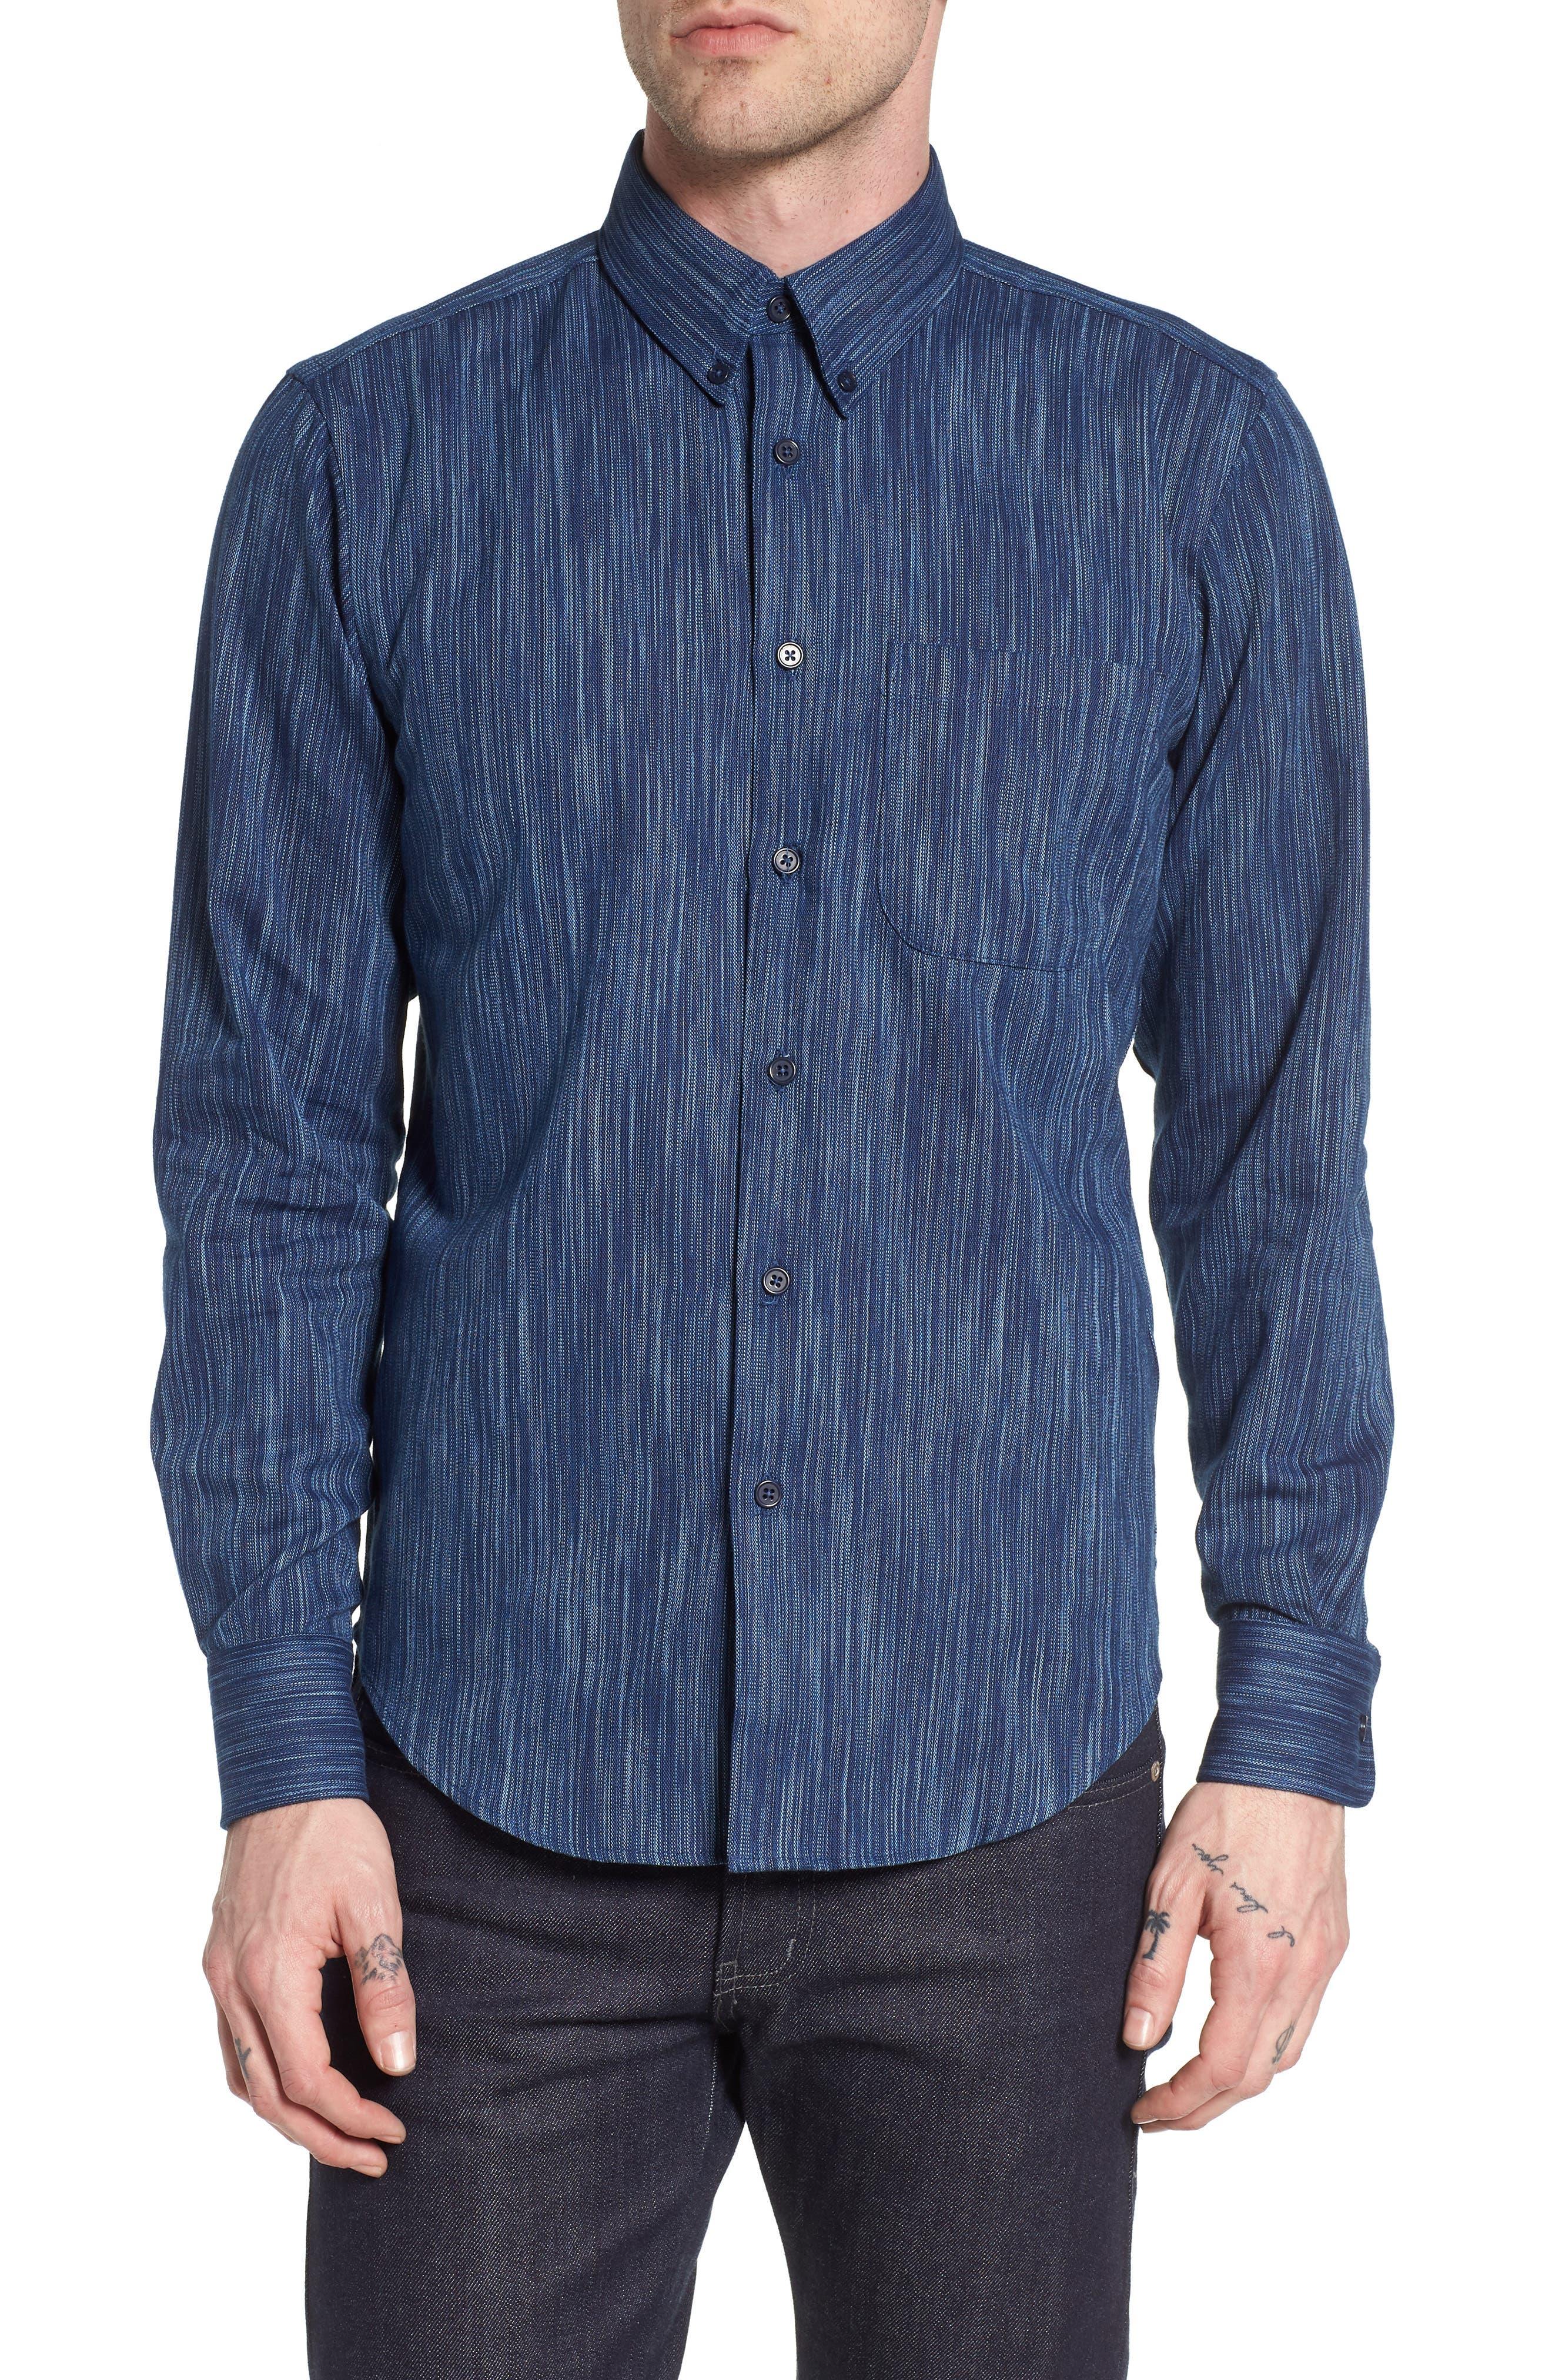 Indigo Tie Dye Rain Weave Shirt,                             Main thumbnail 1, color,                             401